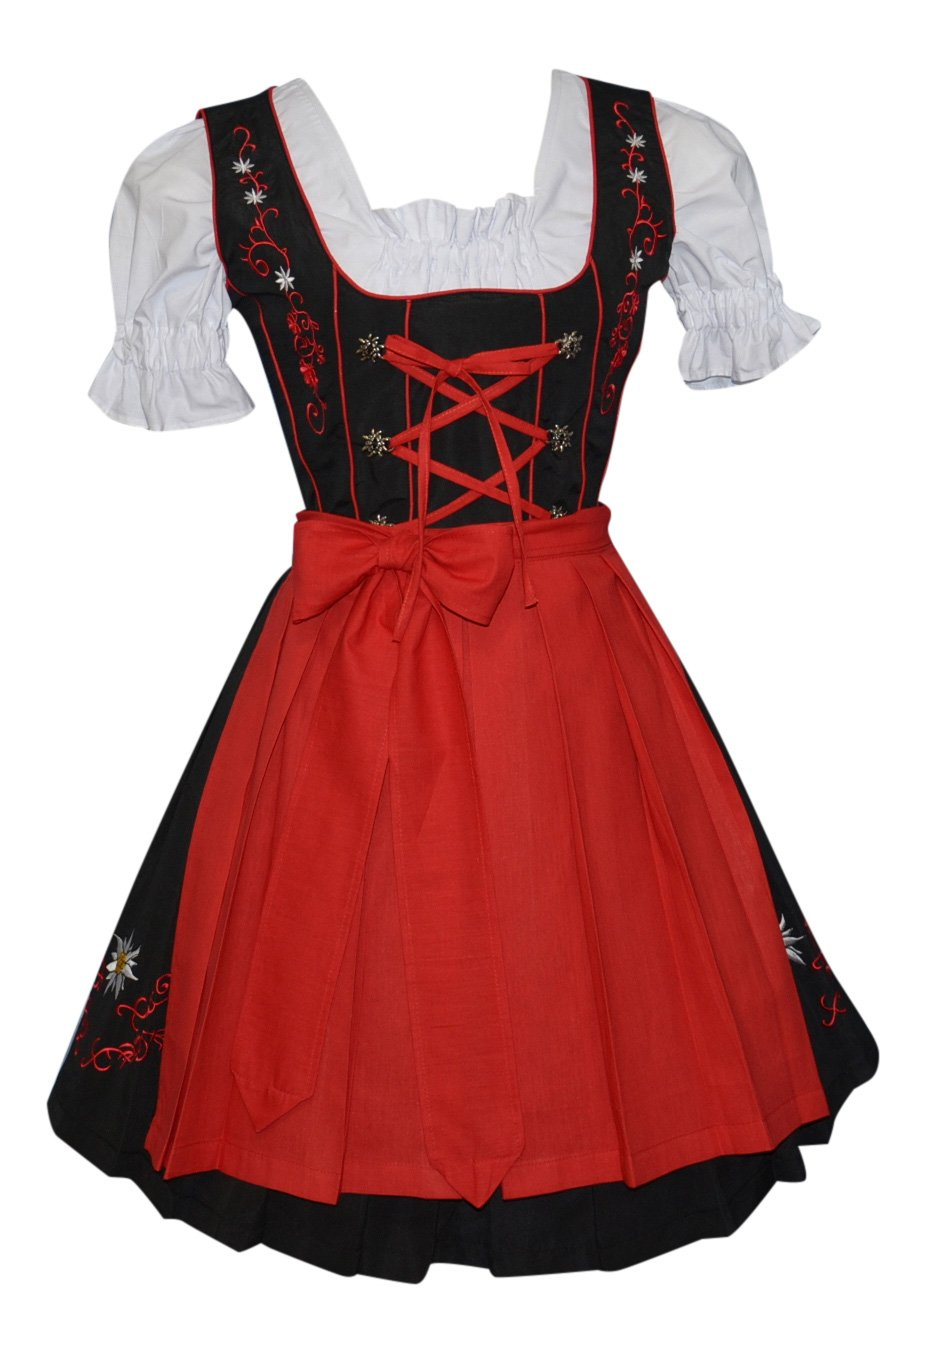 Edelweiss Creek 3-Piece Short German Party Oktoberfest Dirndl Dress Black & Red (16)